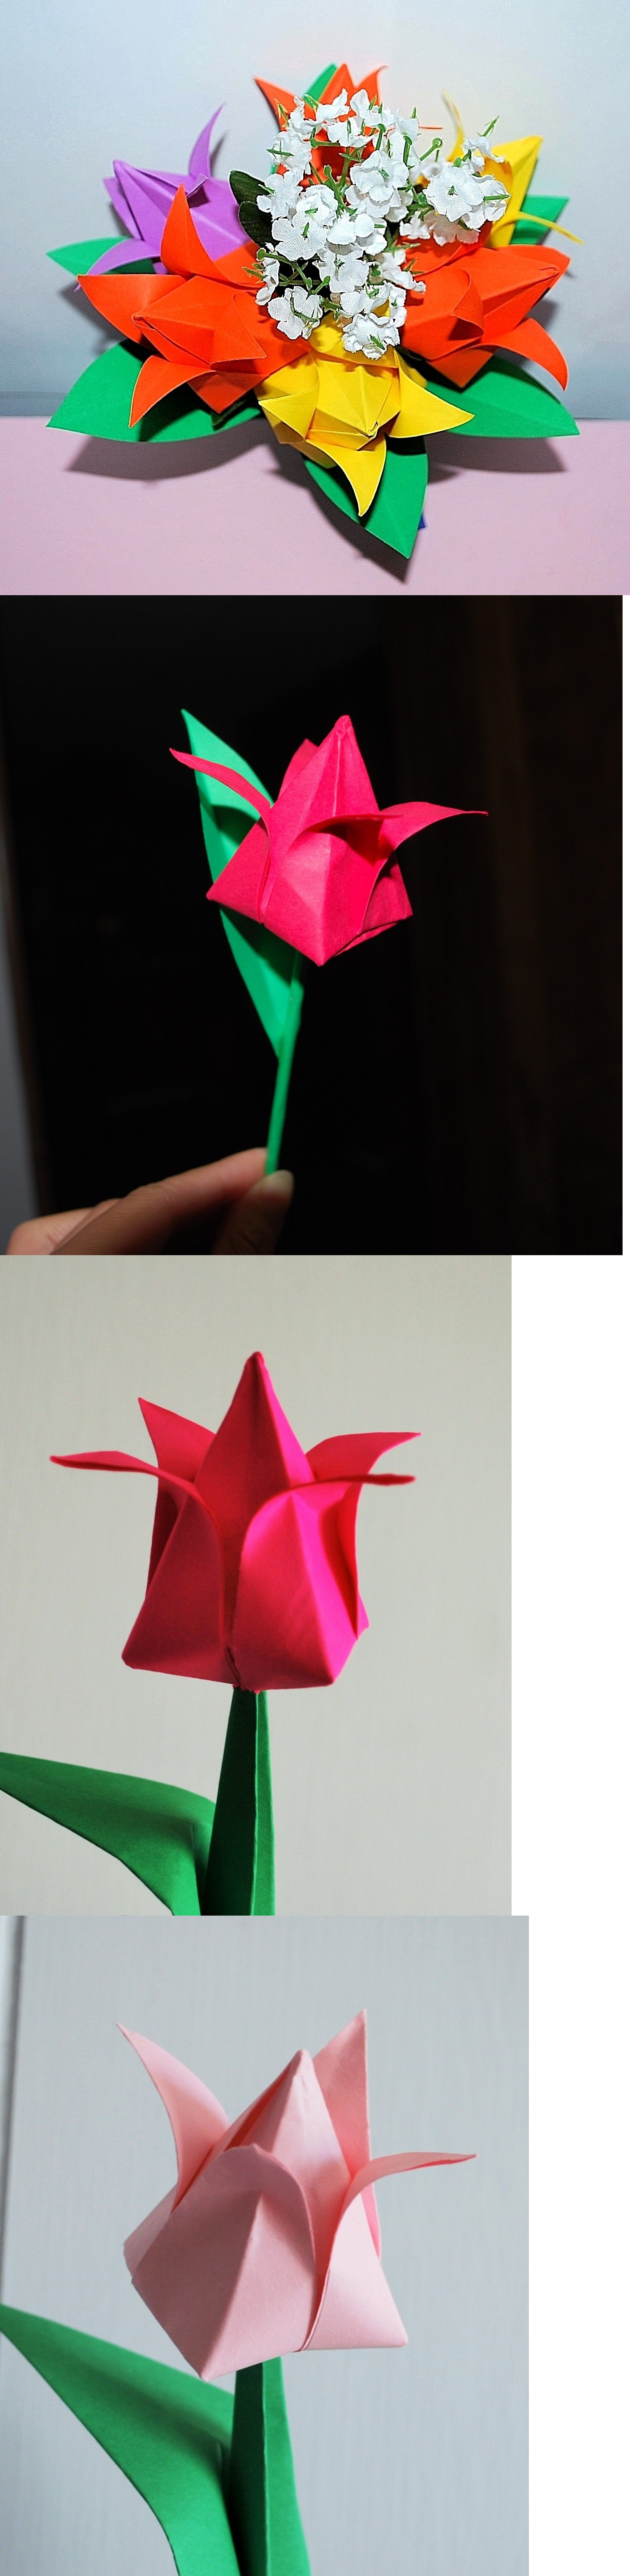 Origami 134596 Origami Paper Tulips Flowers Bouquet Centerpiece